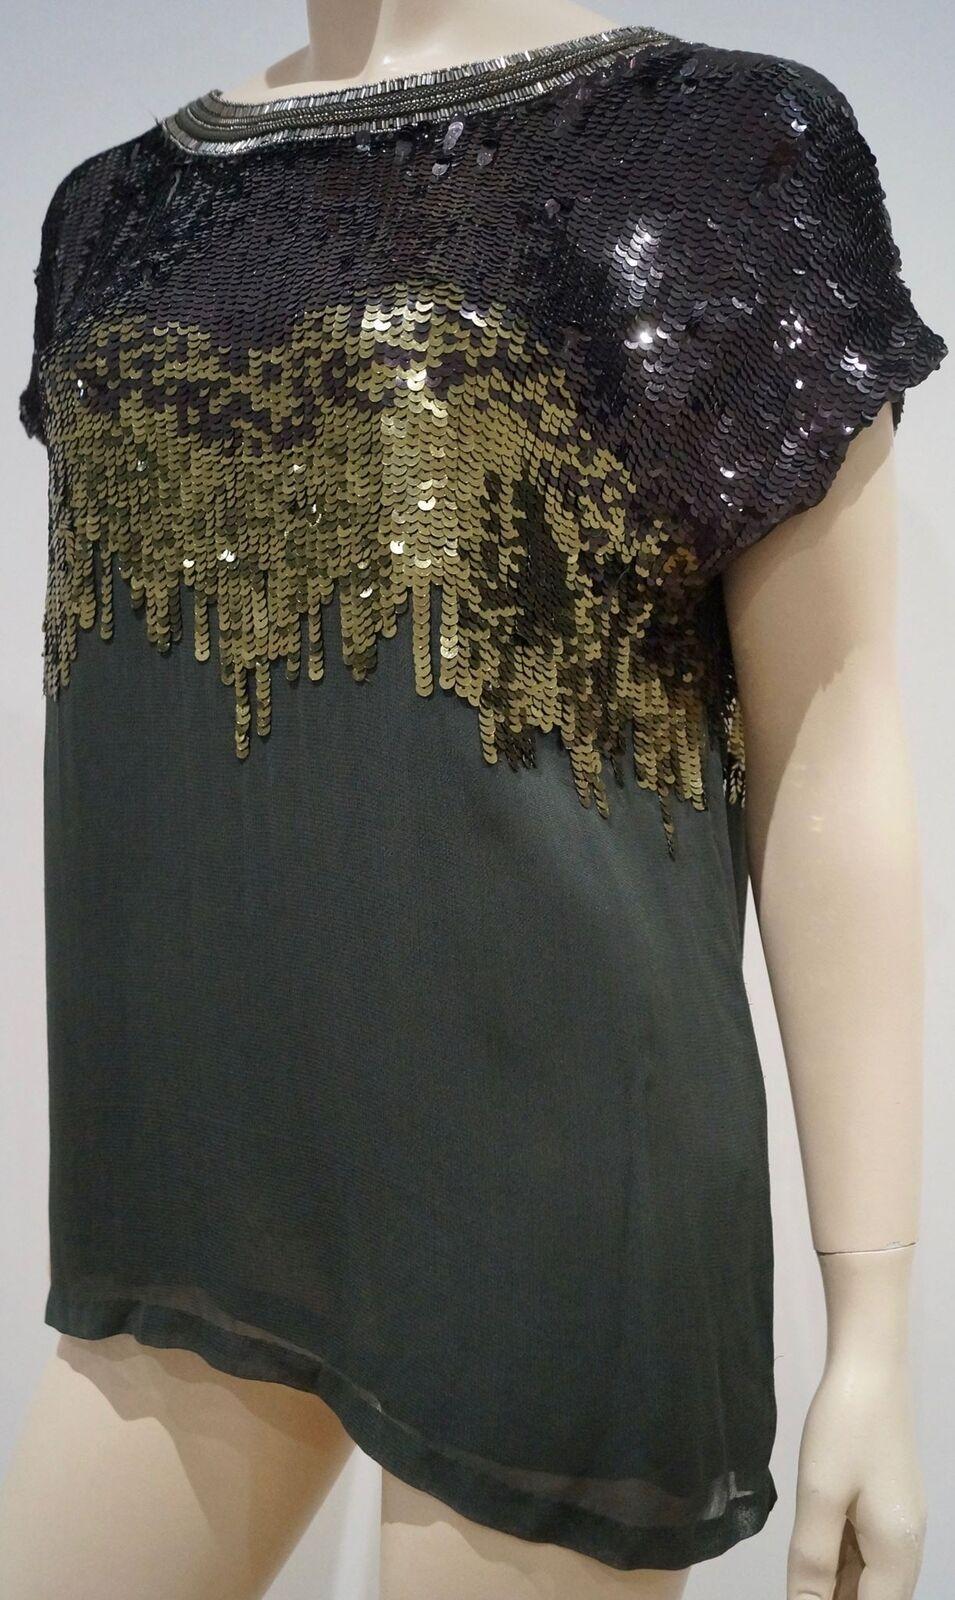 MATTHEW WILLIAMSON schwarz Olive Grün Ombre Sequin Embellished Blouse Top GB6